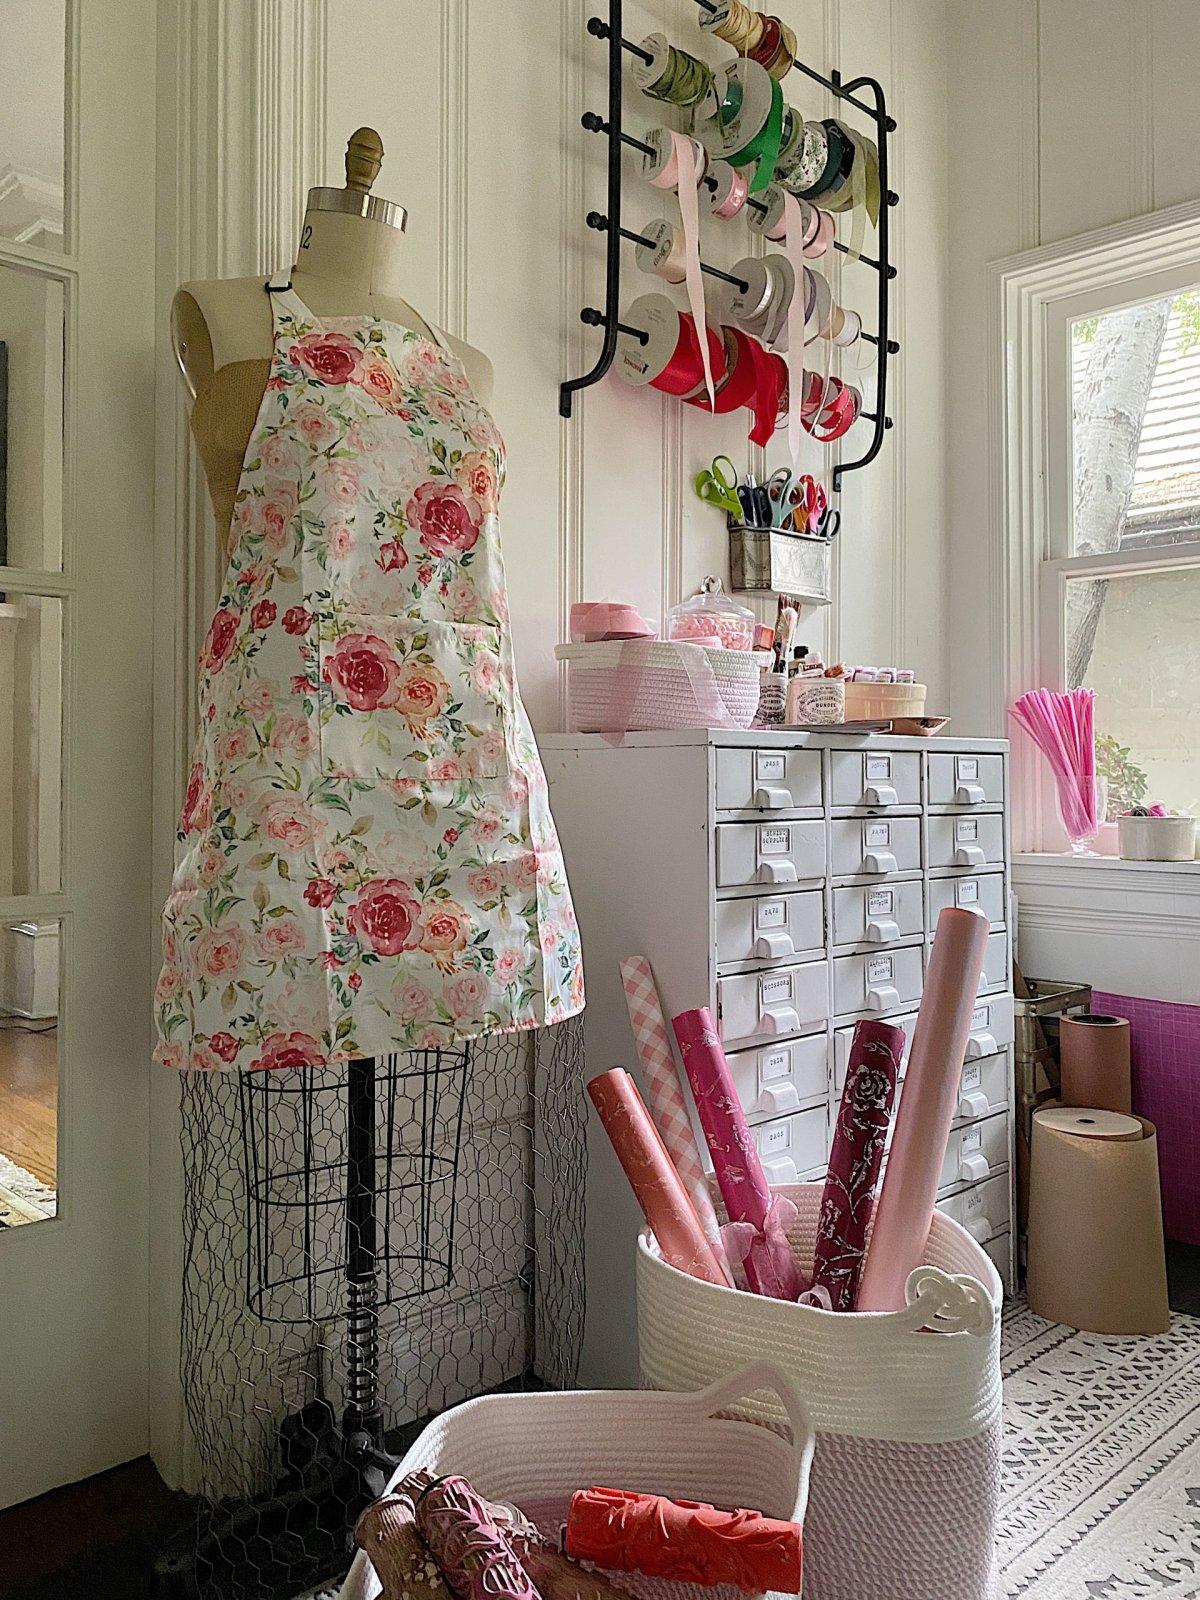 Craft Room Organization in Pink